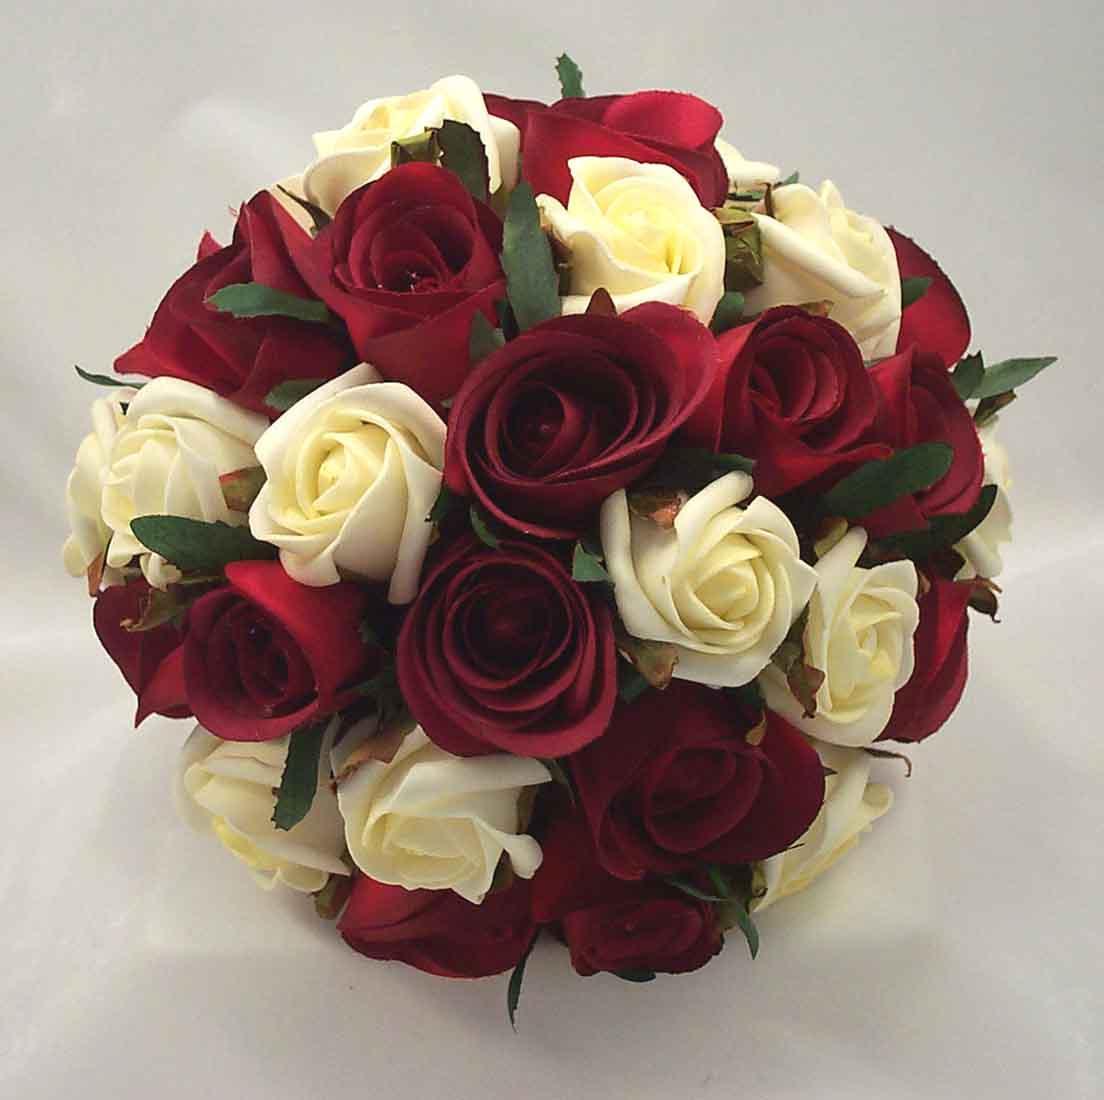 Burgundy silk wedding flower ideas burgundy ivory rose bridal published december 14 2015 at 1104 1100 in rose bridal bouquets mightylinksfo